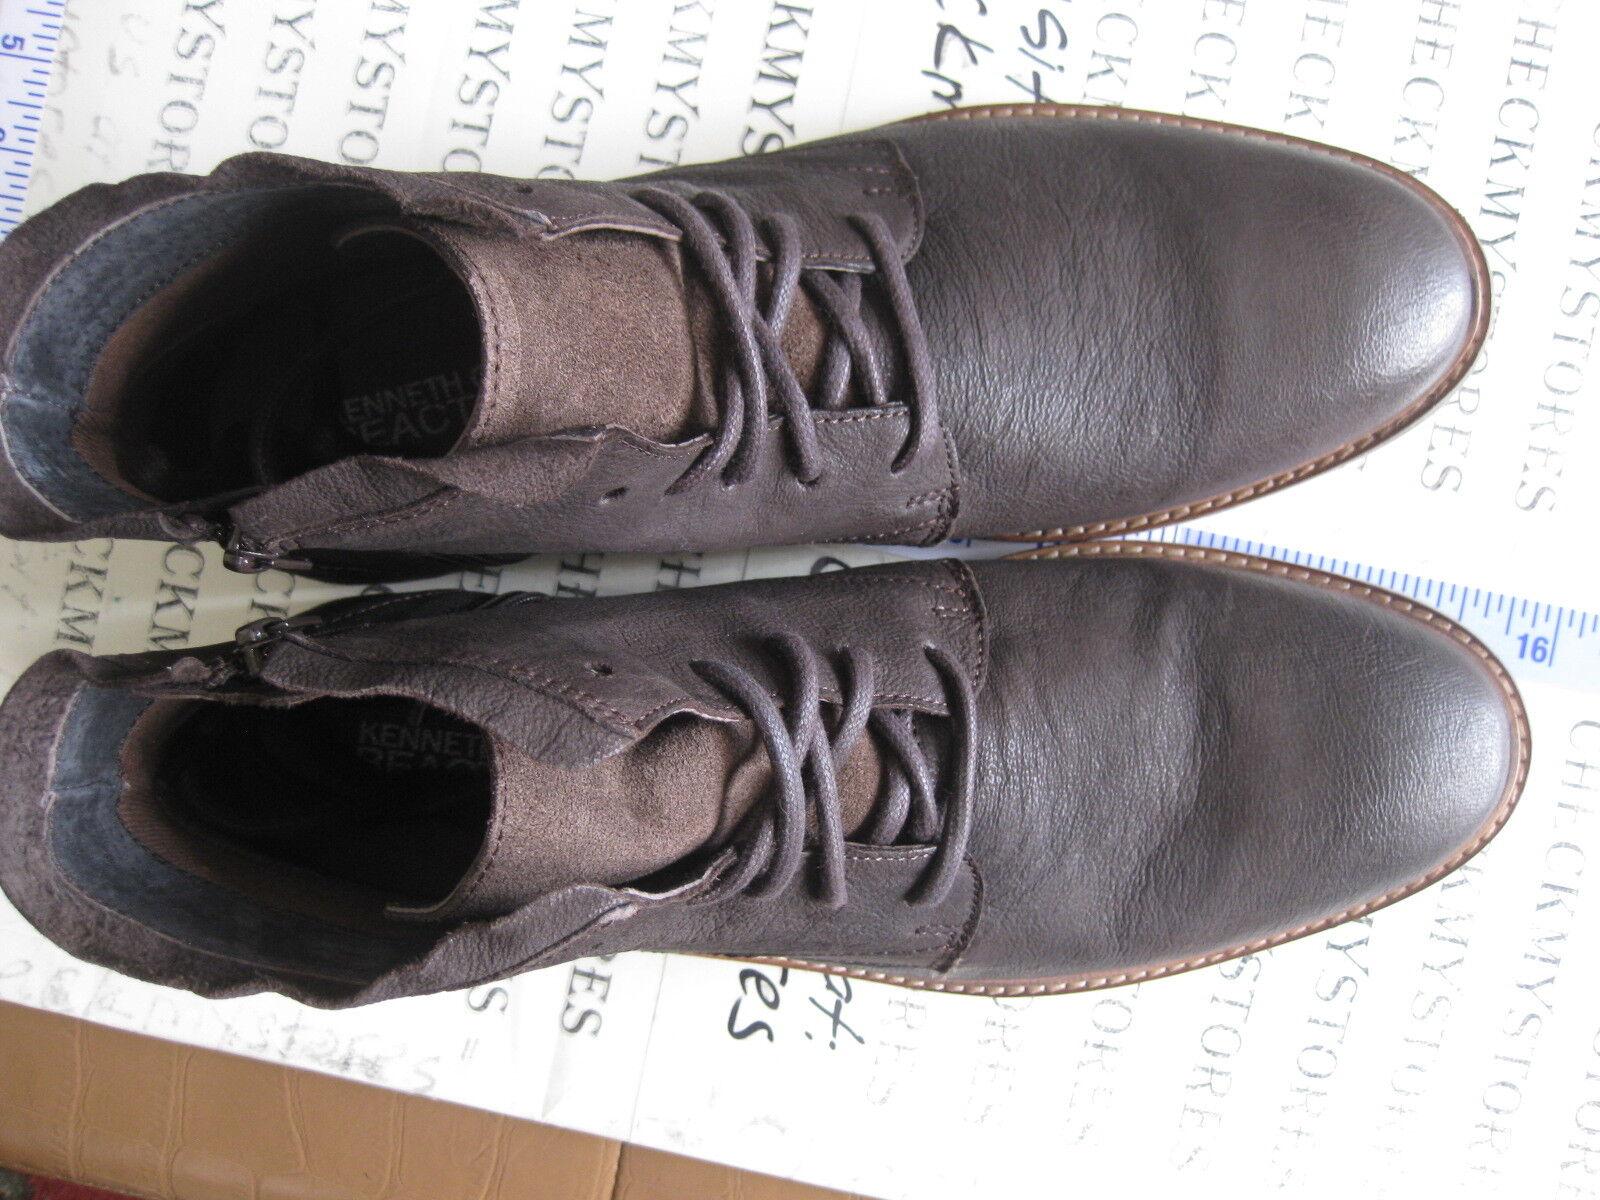 NEW Kenneth Cole REACTION Prove It 2 ME Lace-Up Lace-Up Lace-Up Leather Stiefel CHOOSE GrößeS 0105e9